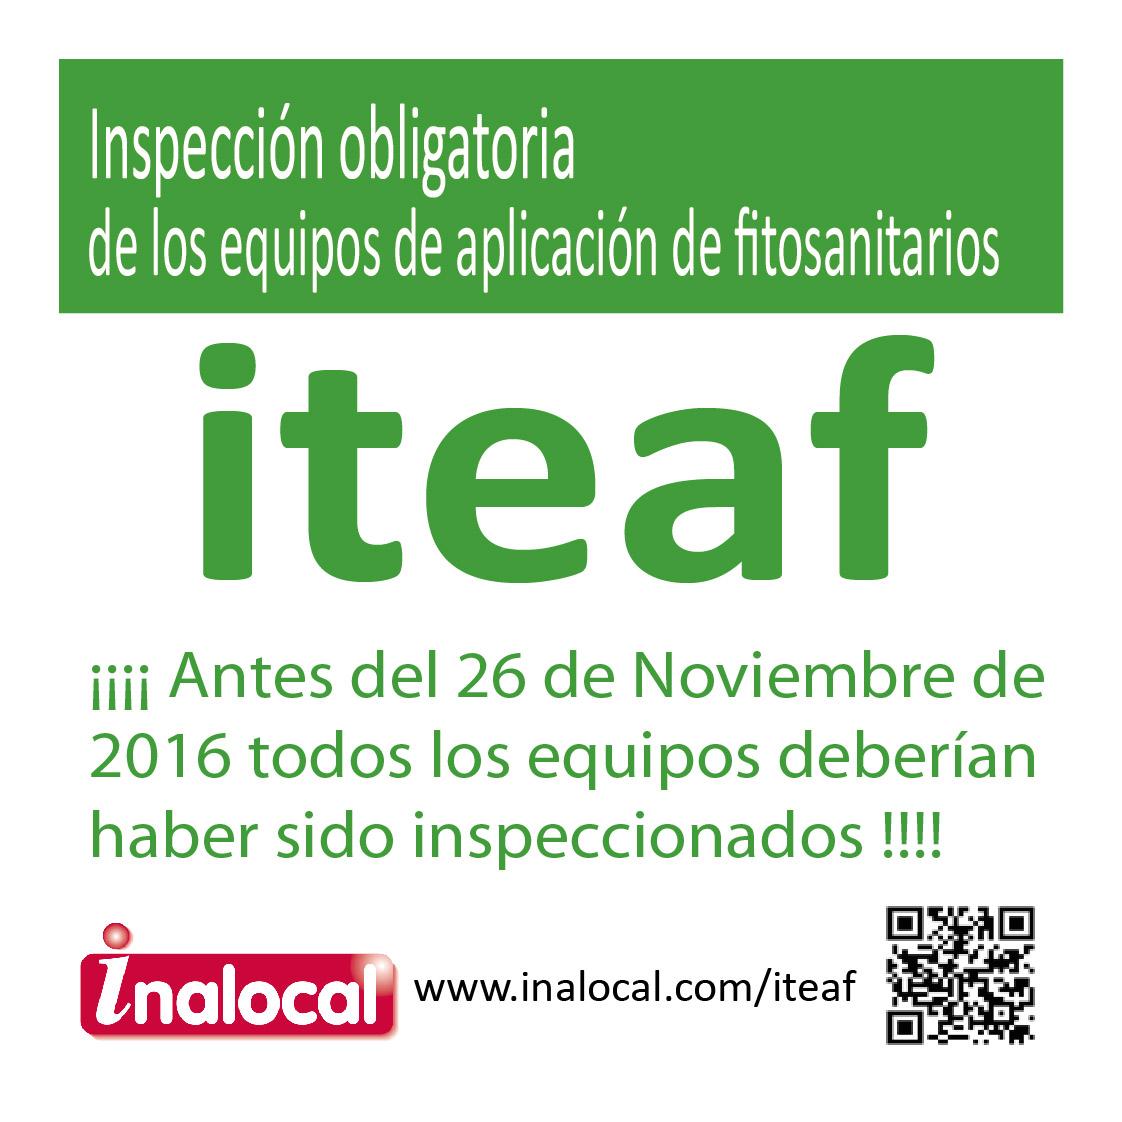 ITEAF en Comunidad de Madrid castilla la mancha andalucia inalocal